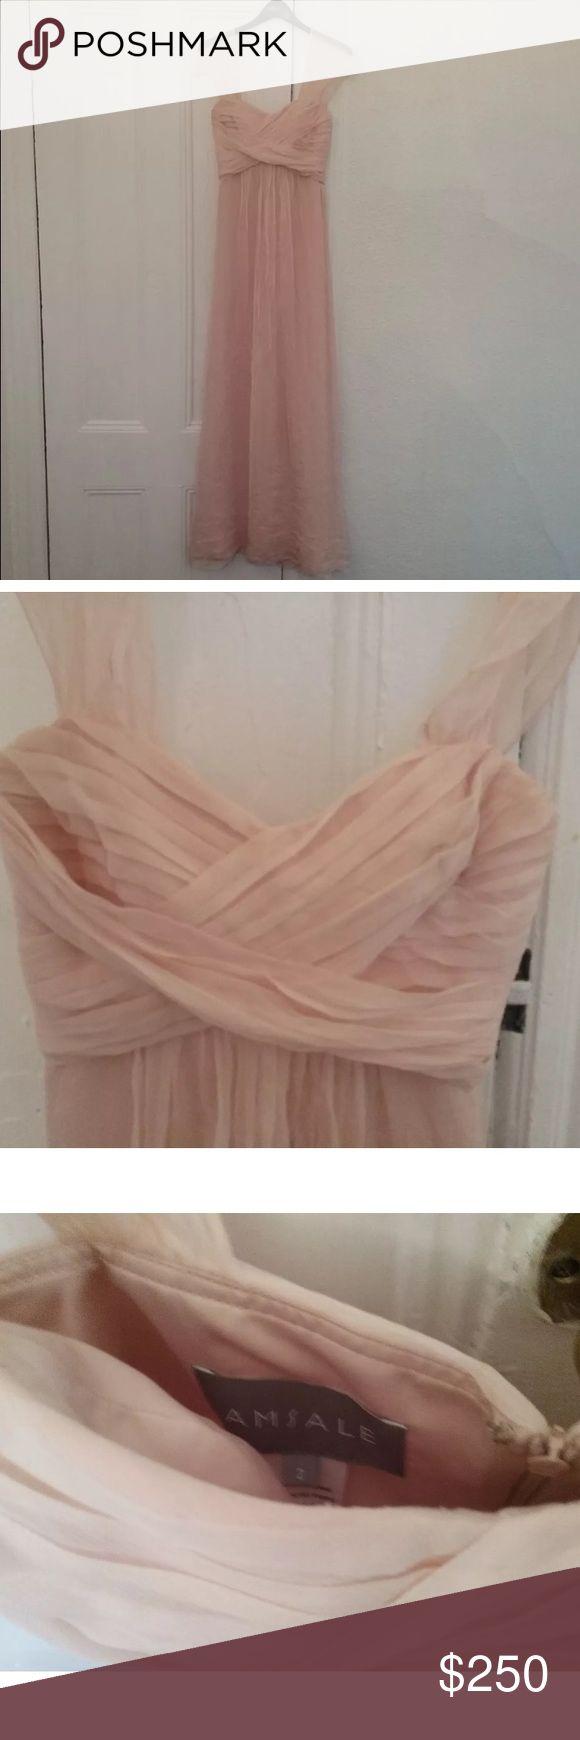 Amsale blush size 2 style G851C Beautiful dress unaltered worn once size 2 amsale Dresses Wedding